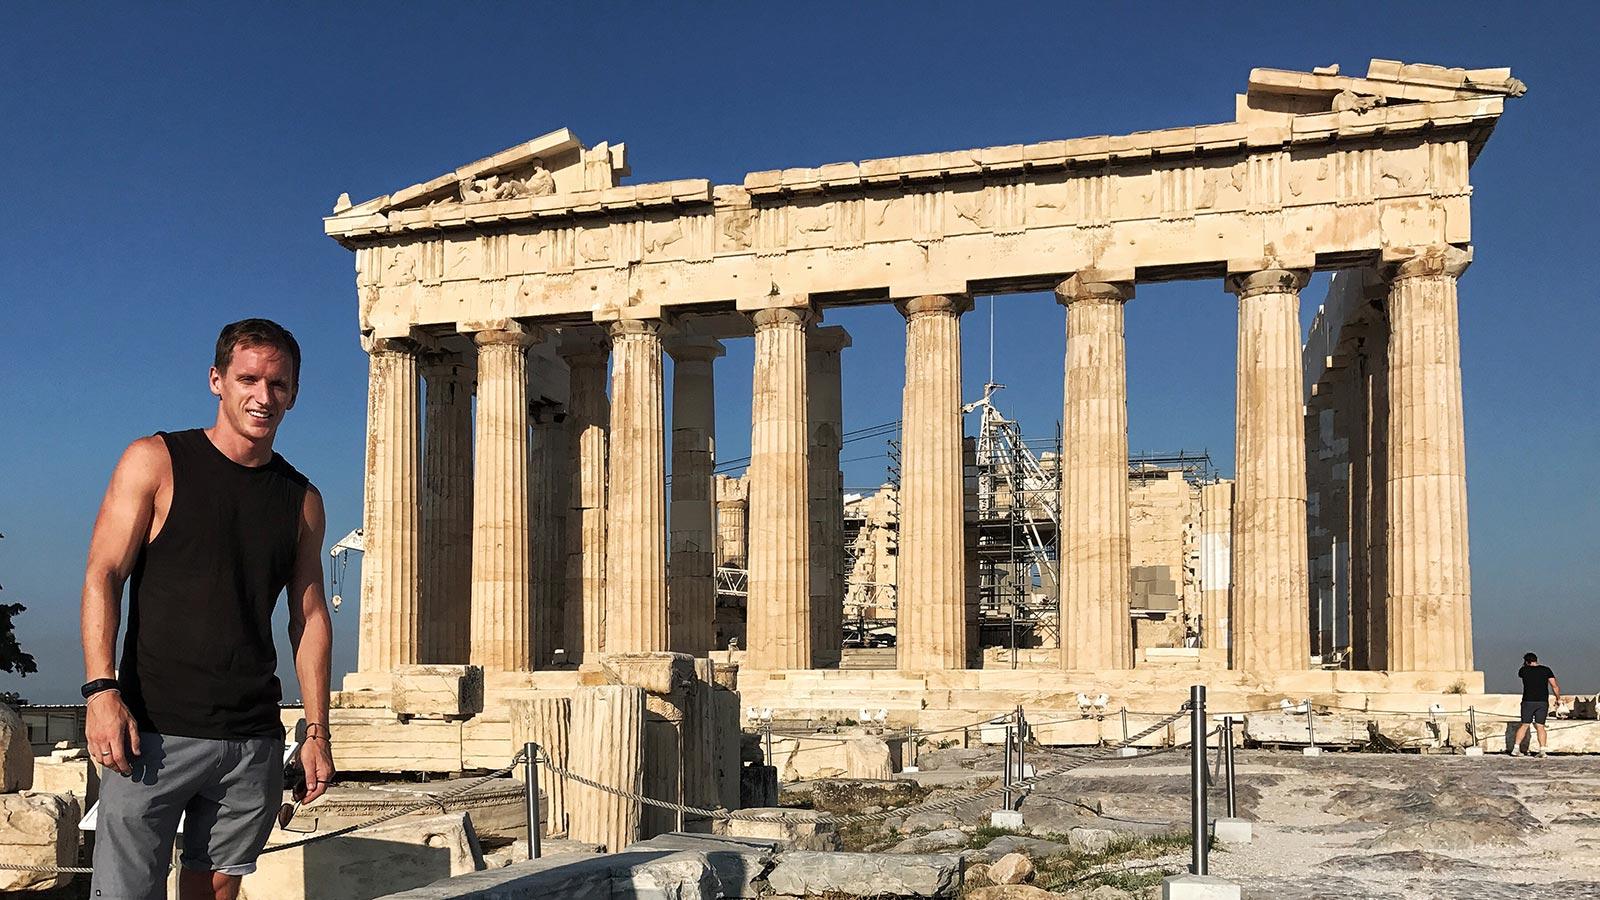 David Simpson by Parthenon at Acropolis in Athens, Greece. Athens has me